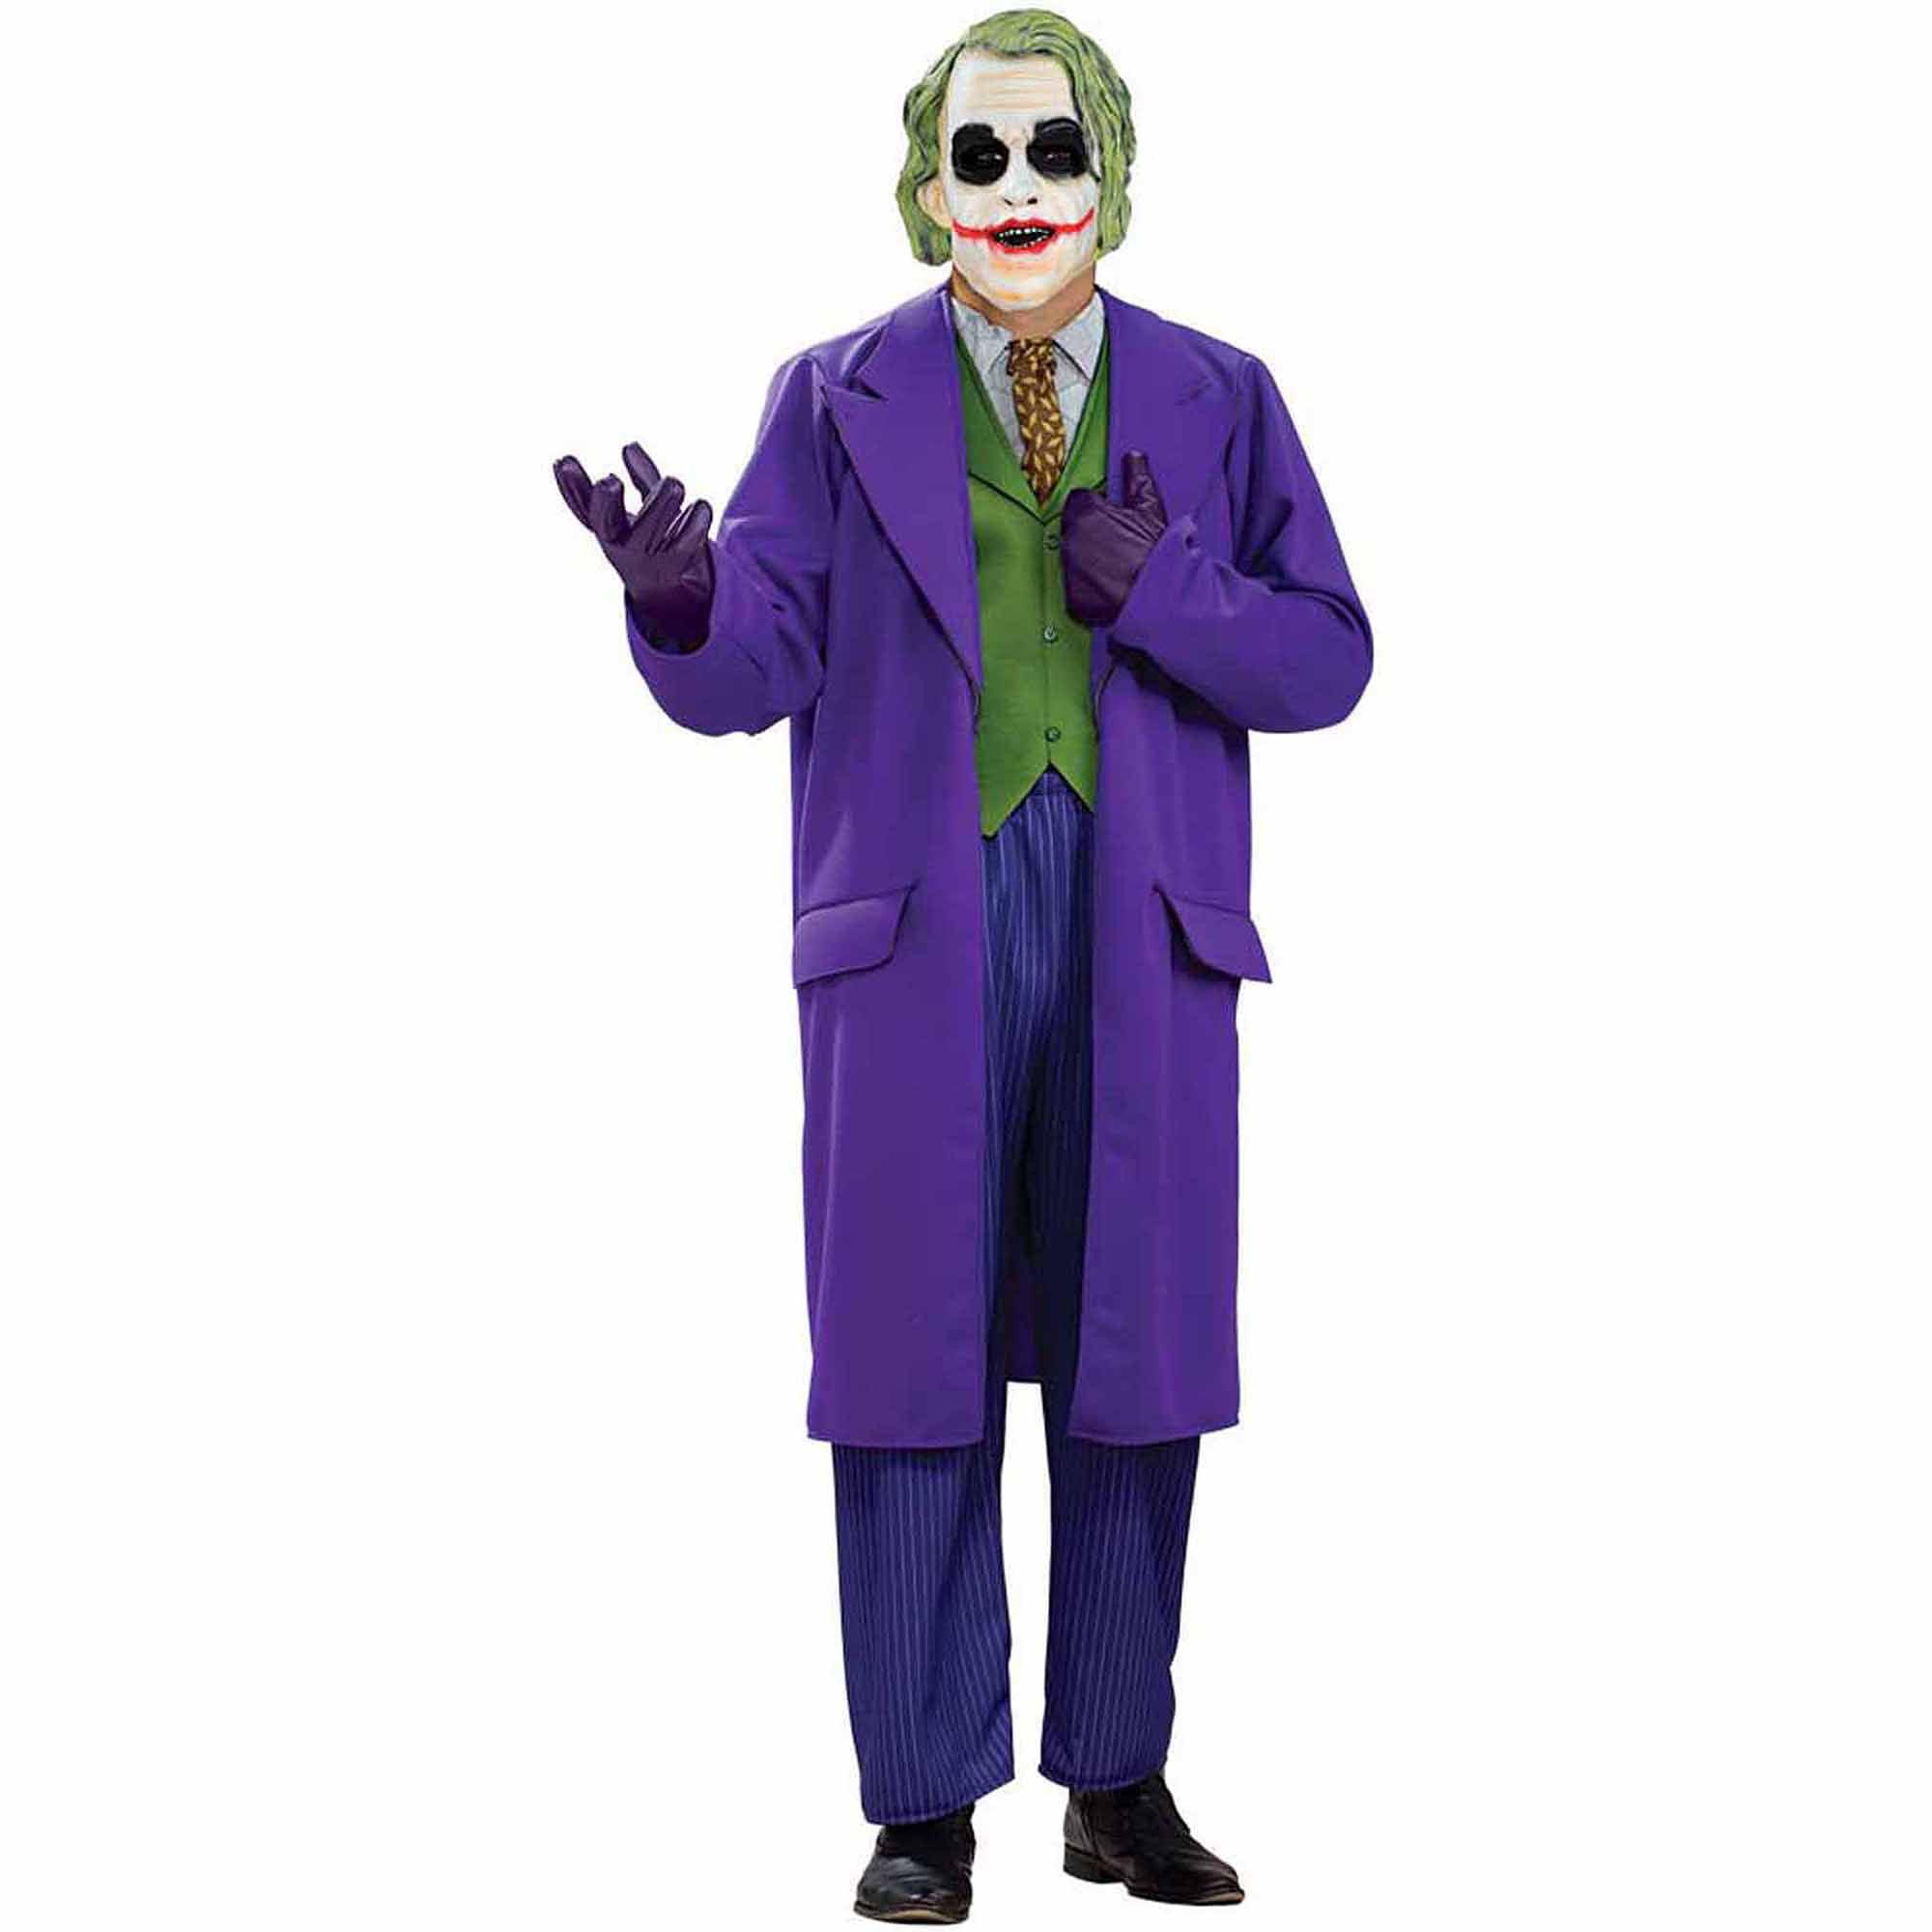 Batman Dark Knight The Joker Deluxe Adult Halloween Costume  sc 1 st  Walmart & Joker Costumes